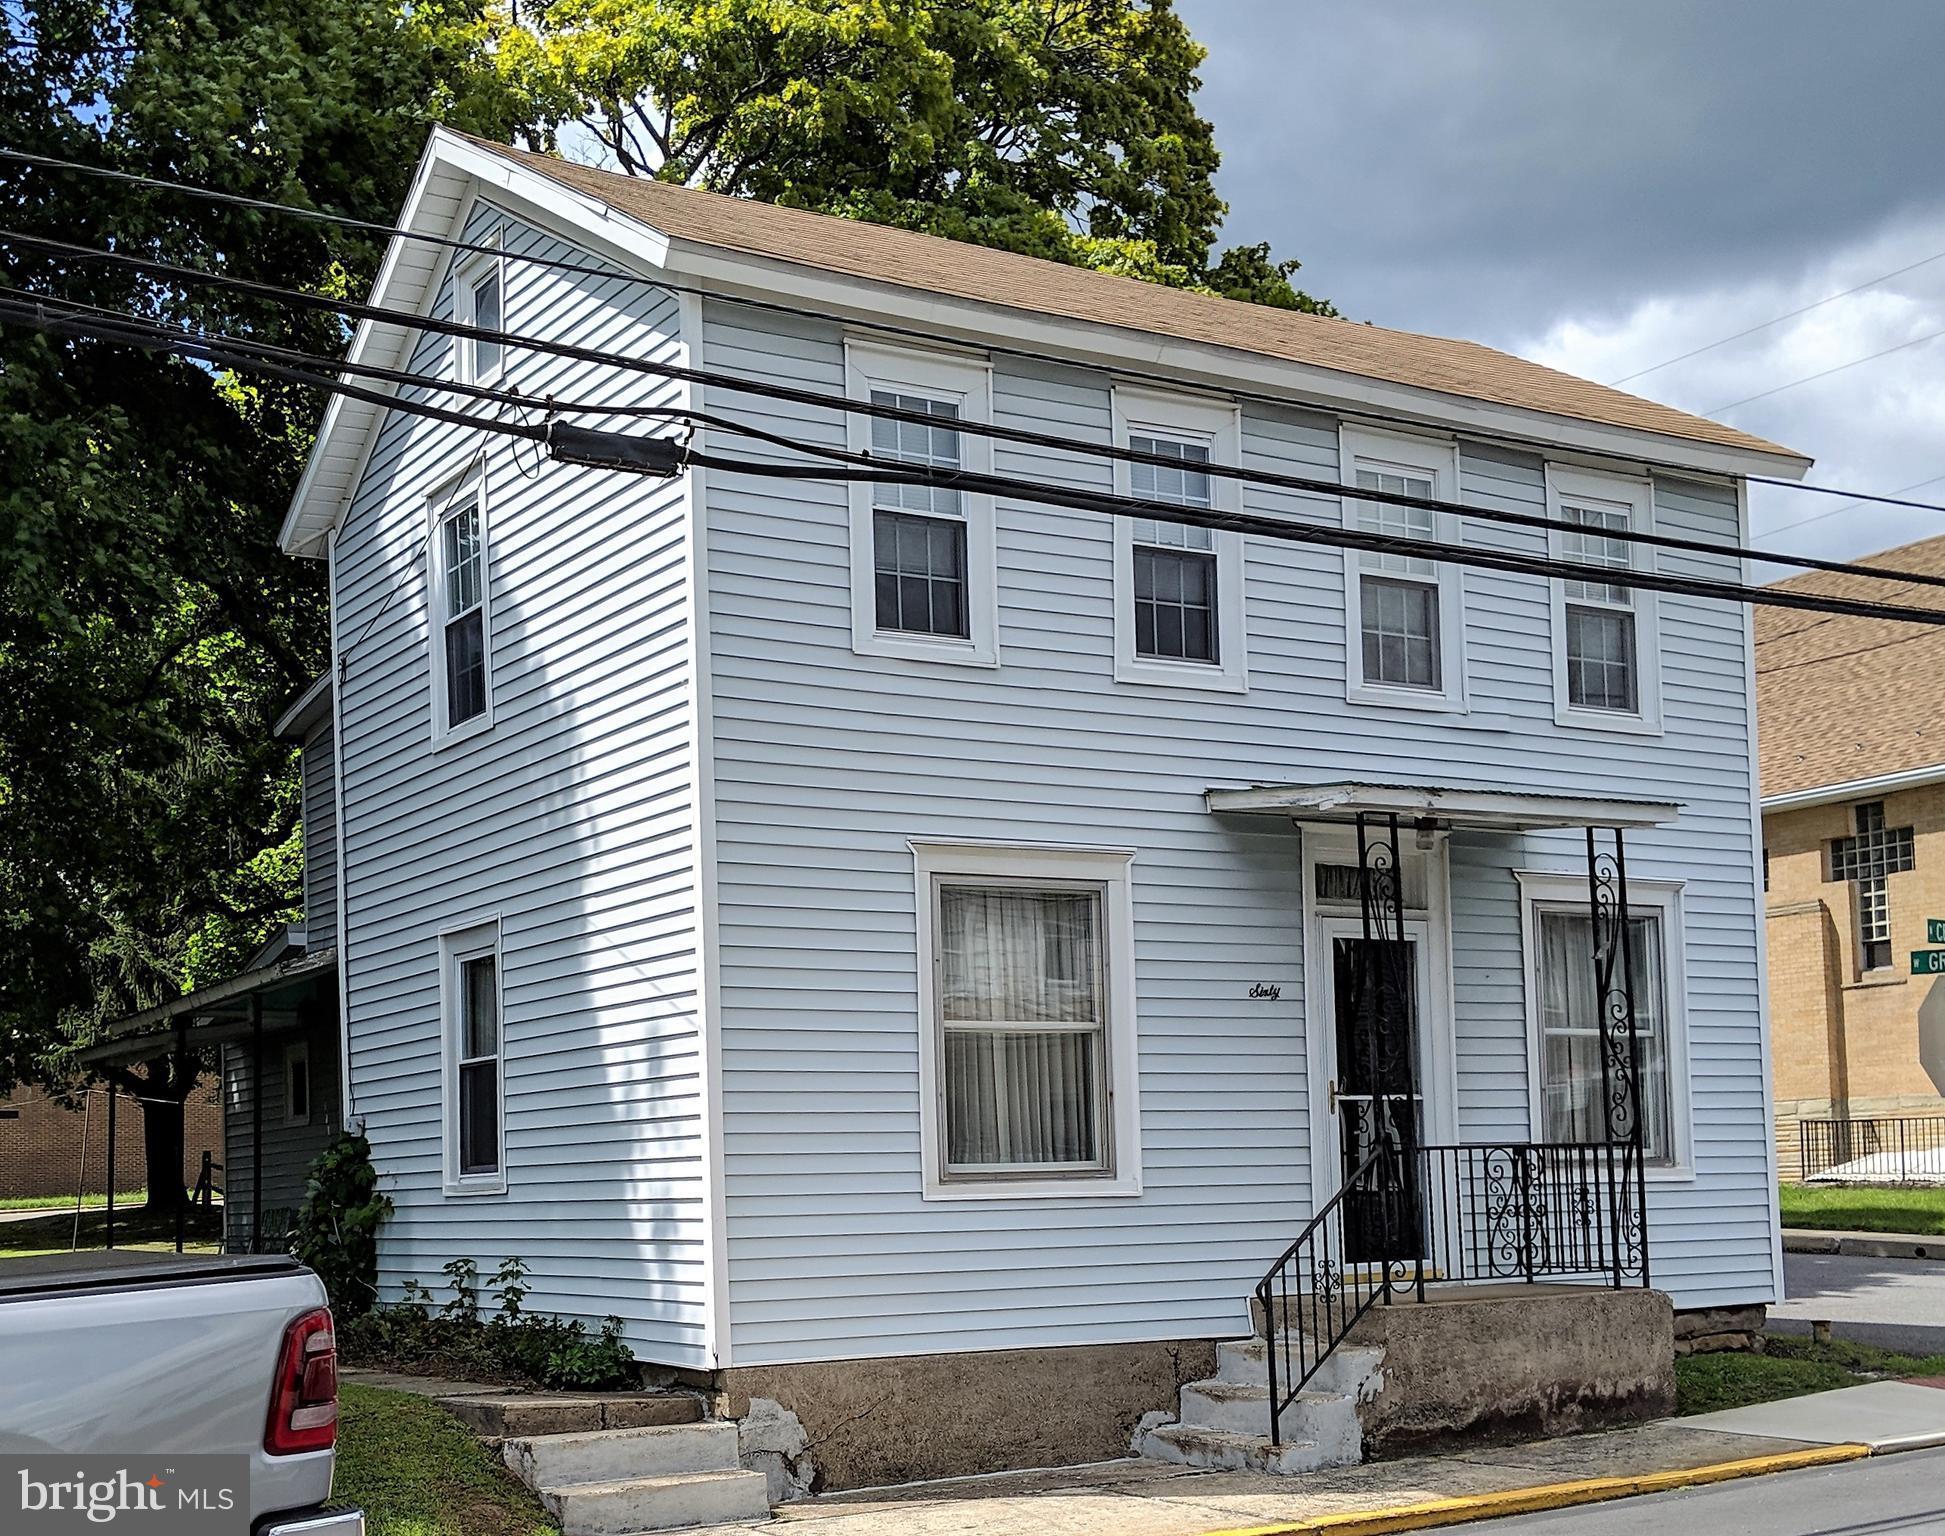 60 N CENTER STREET, RINGTOWN, PA 17967